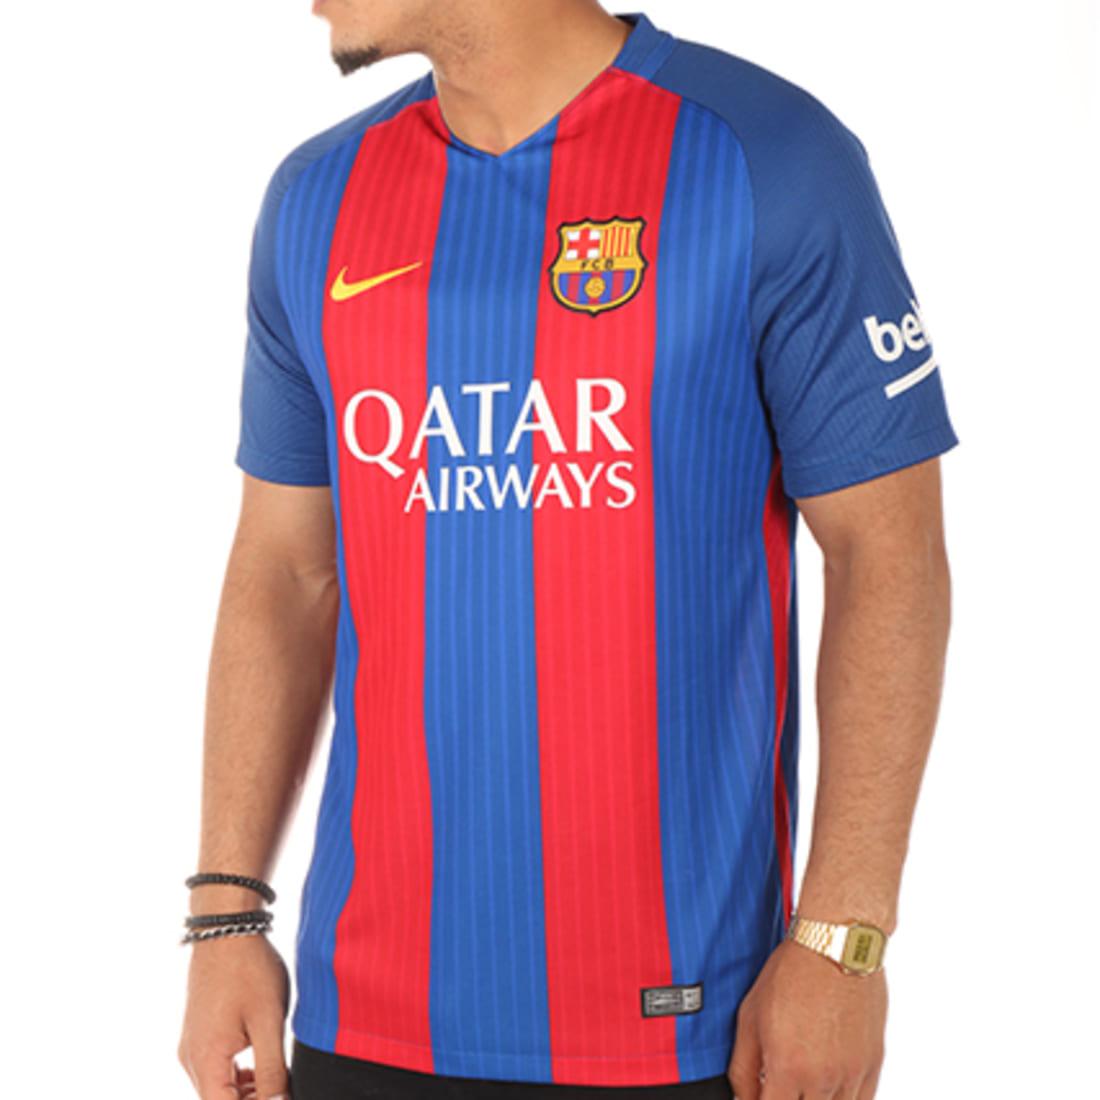 Mensurable Drama 945  Nike - Maillot De Football FC Barcelona 776850 415 Bleu Roi Rouge -  LaBoutiqueOfficielle.com